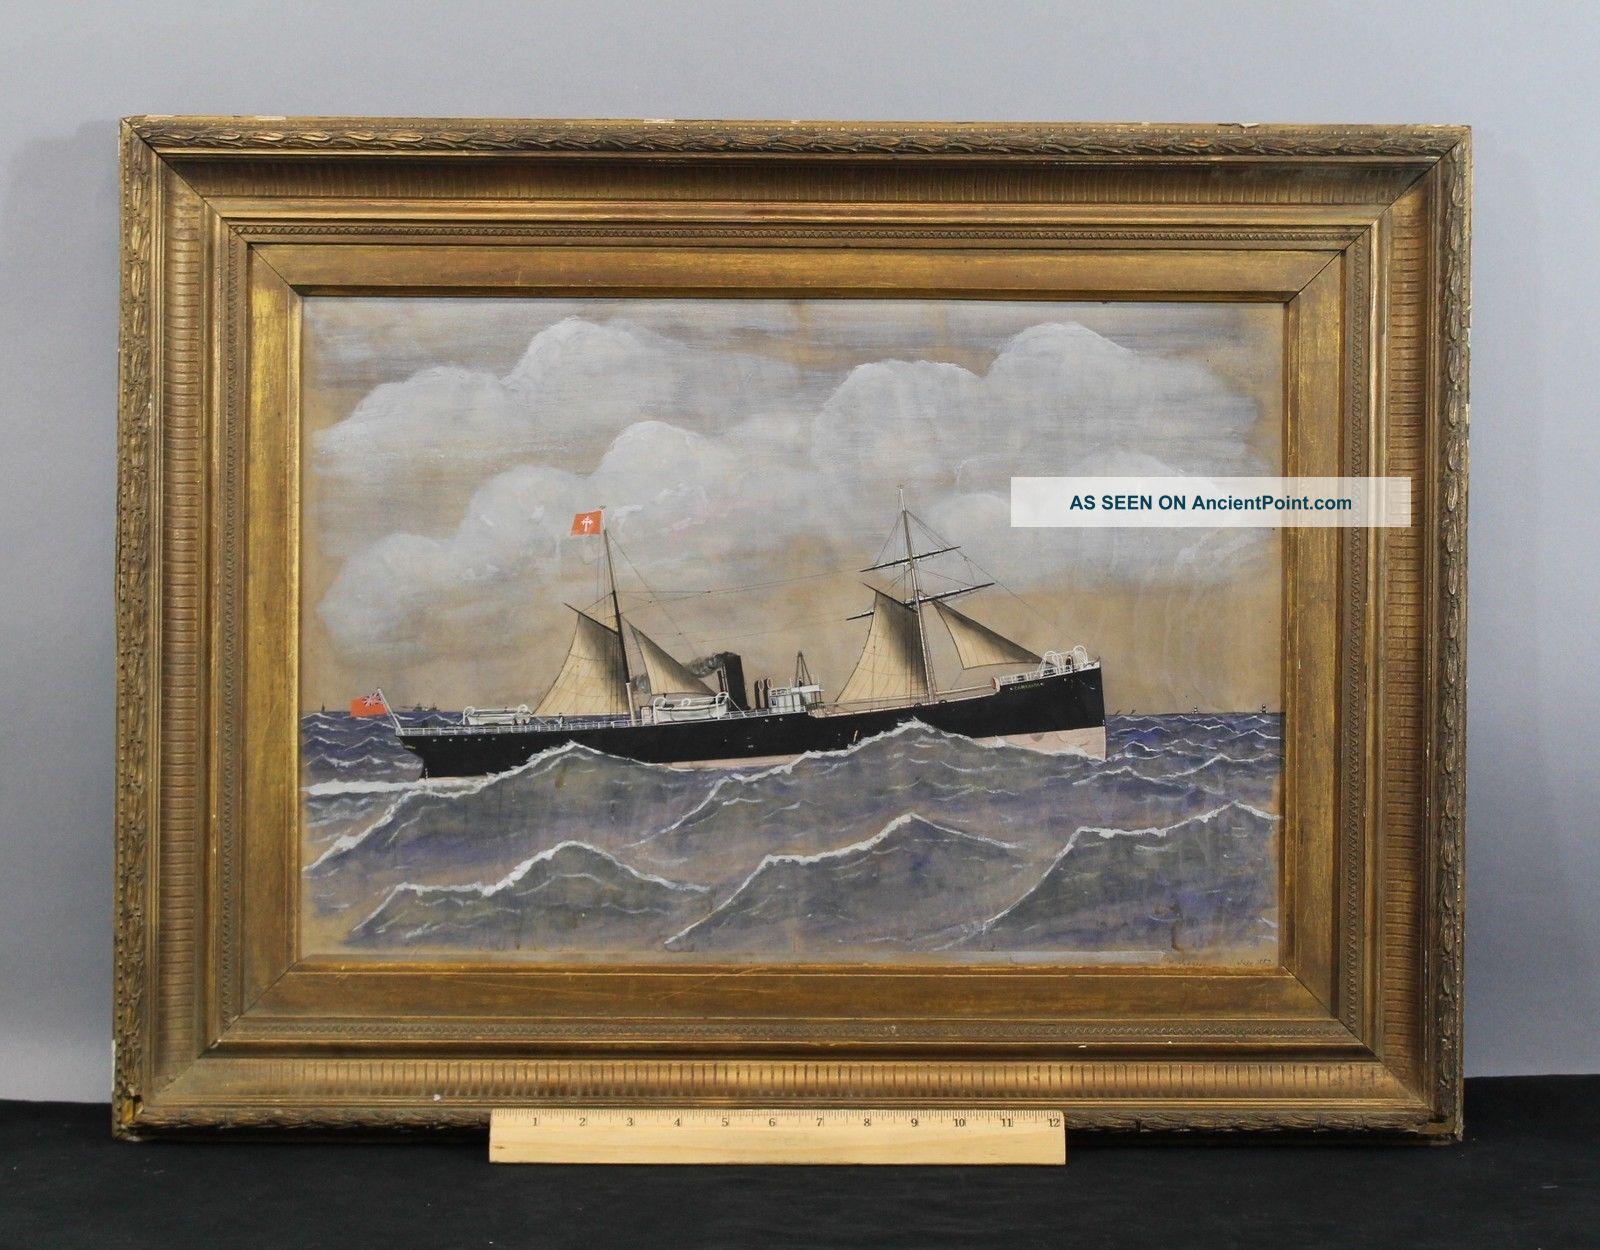 Antique 19thc H.  Johnson Maritime British Steamship Camerata Gouache Painting Other Maritime Antiques photo